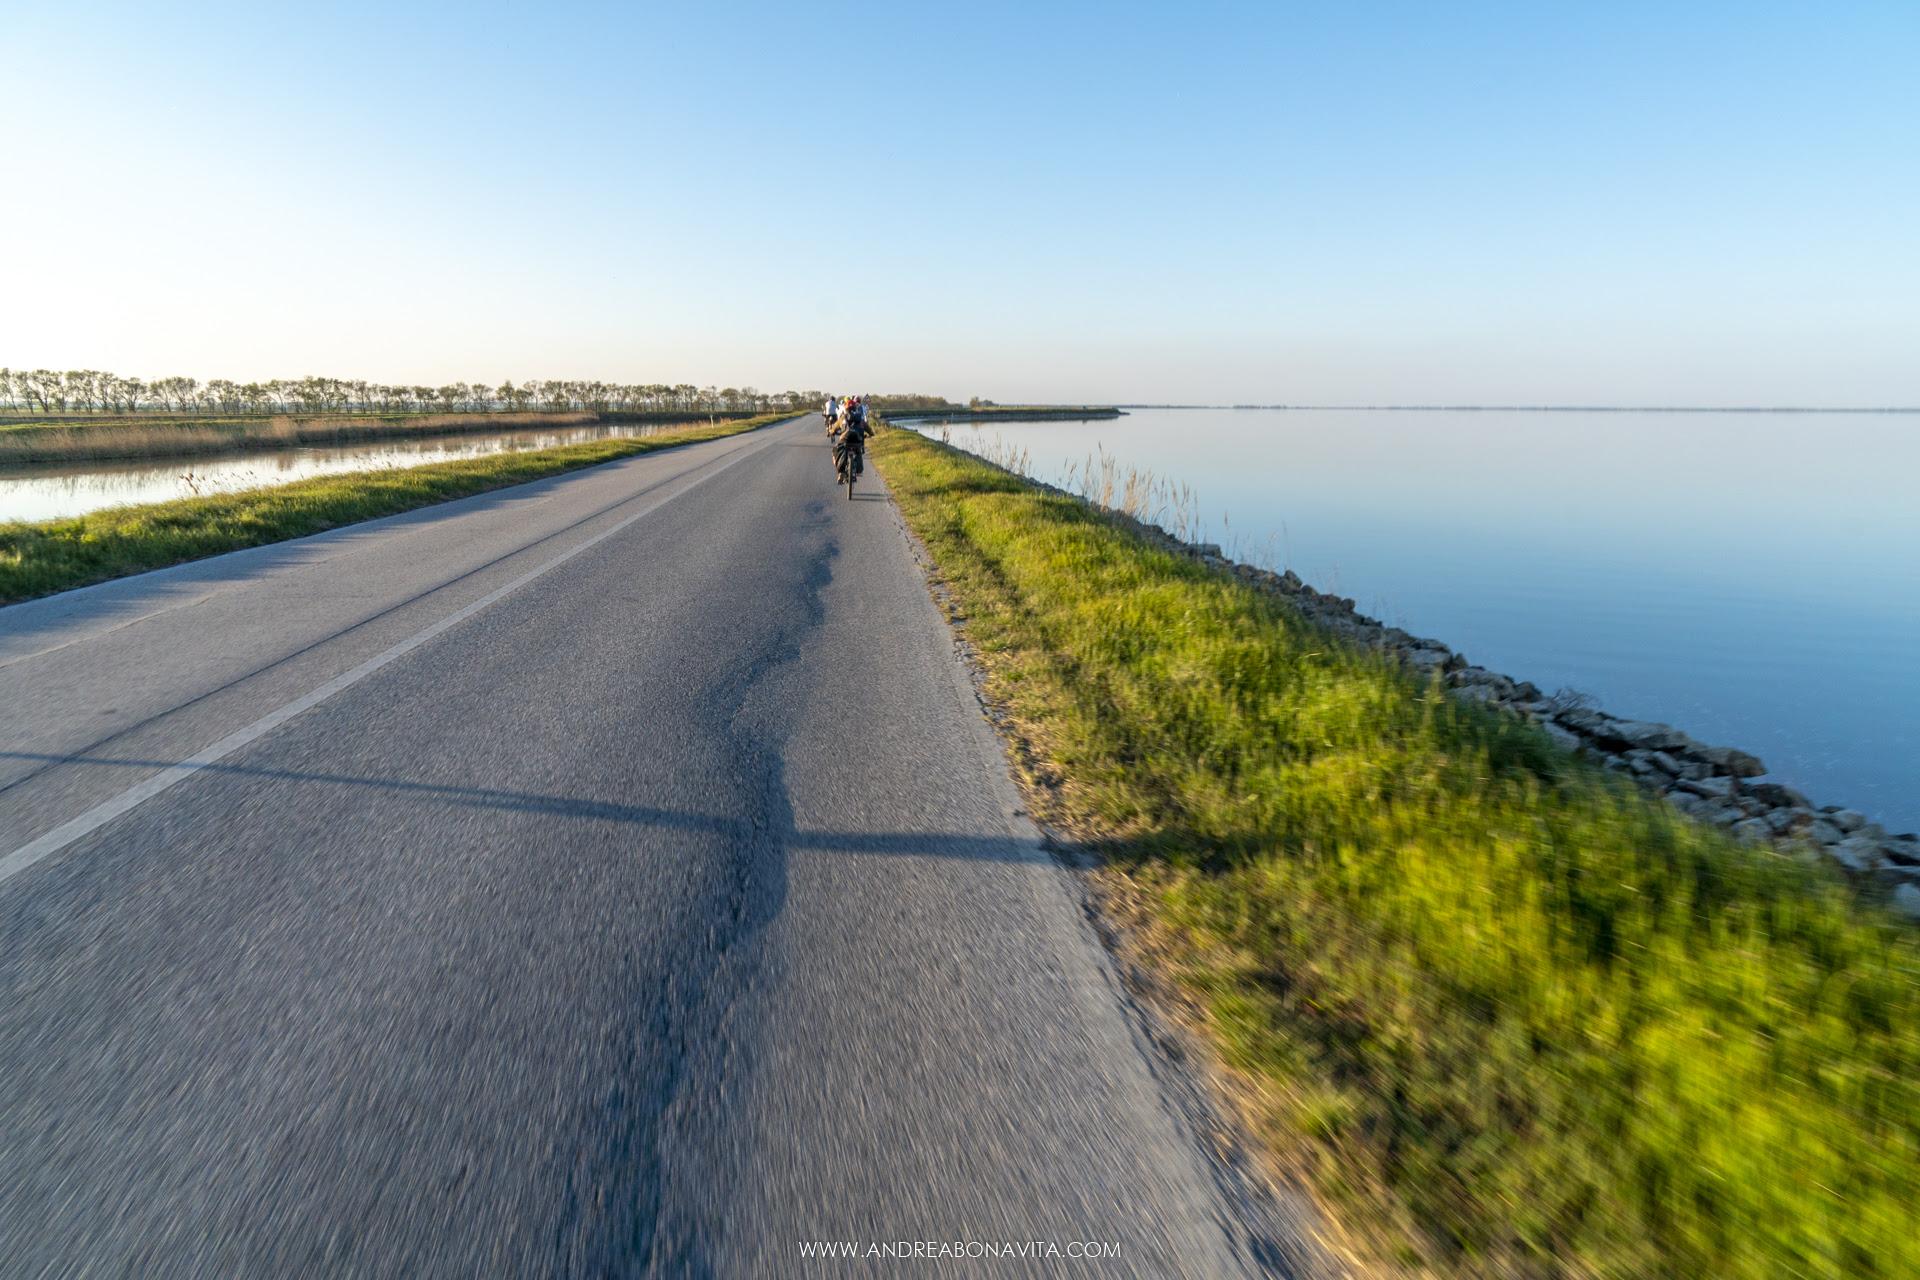 Giro in bici a Cervia: itinerario facile dal centro storico alla pineta